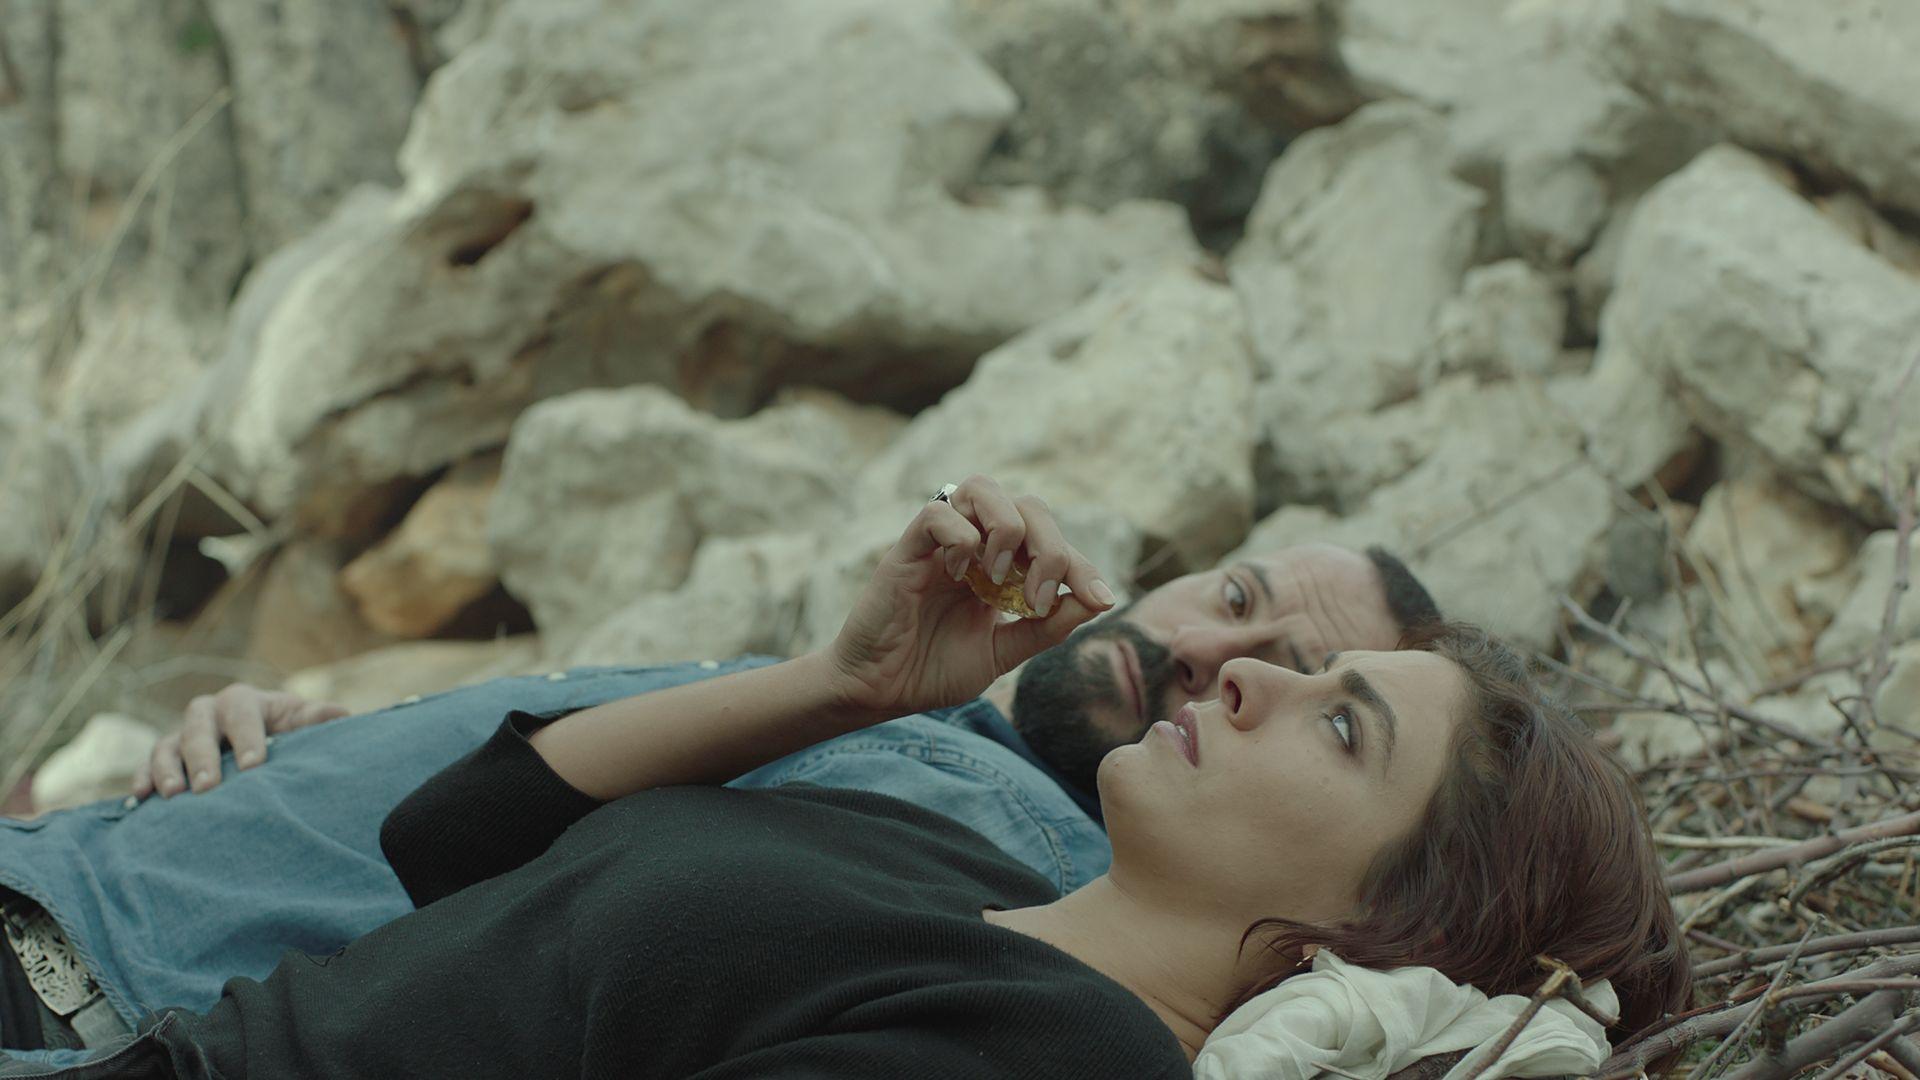 The River by Ghassan Salhab -فيلم النهر إخراج غسان سلهب (5)